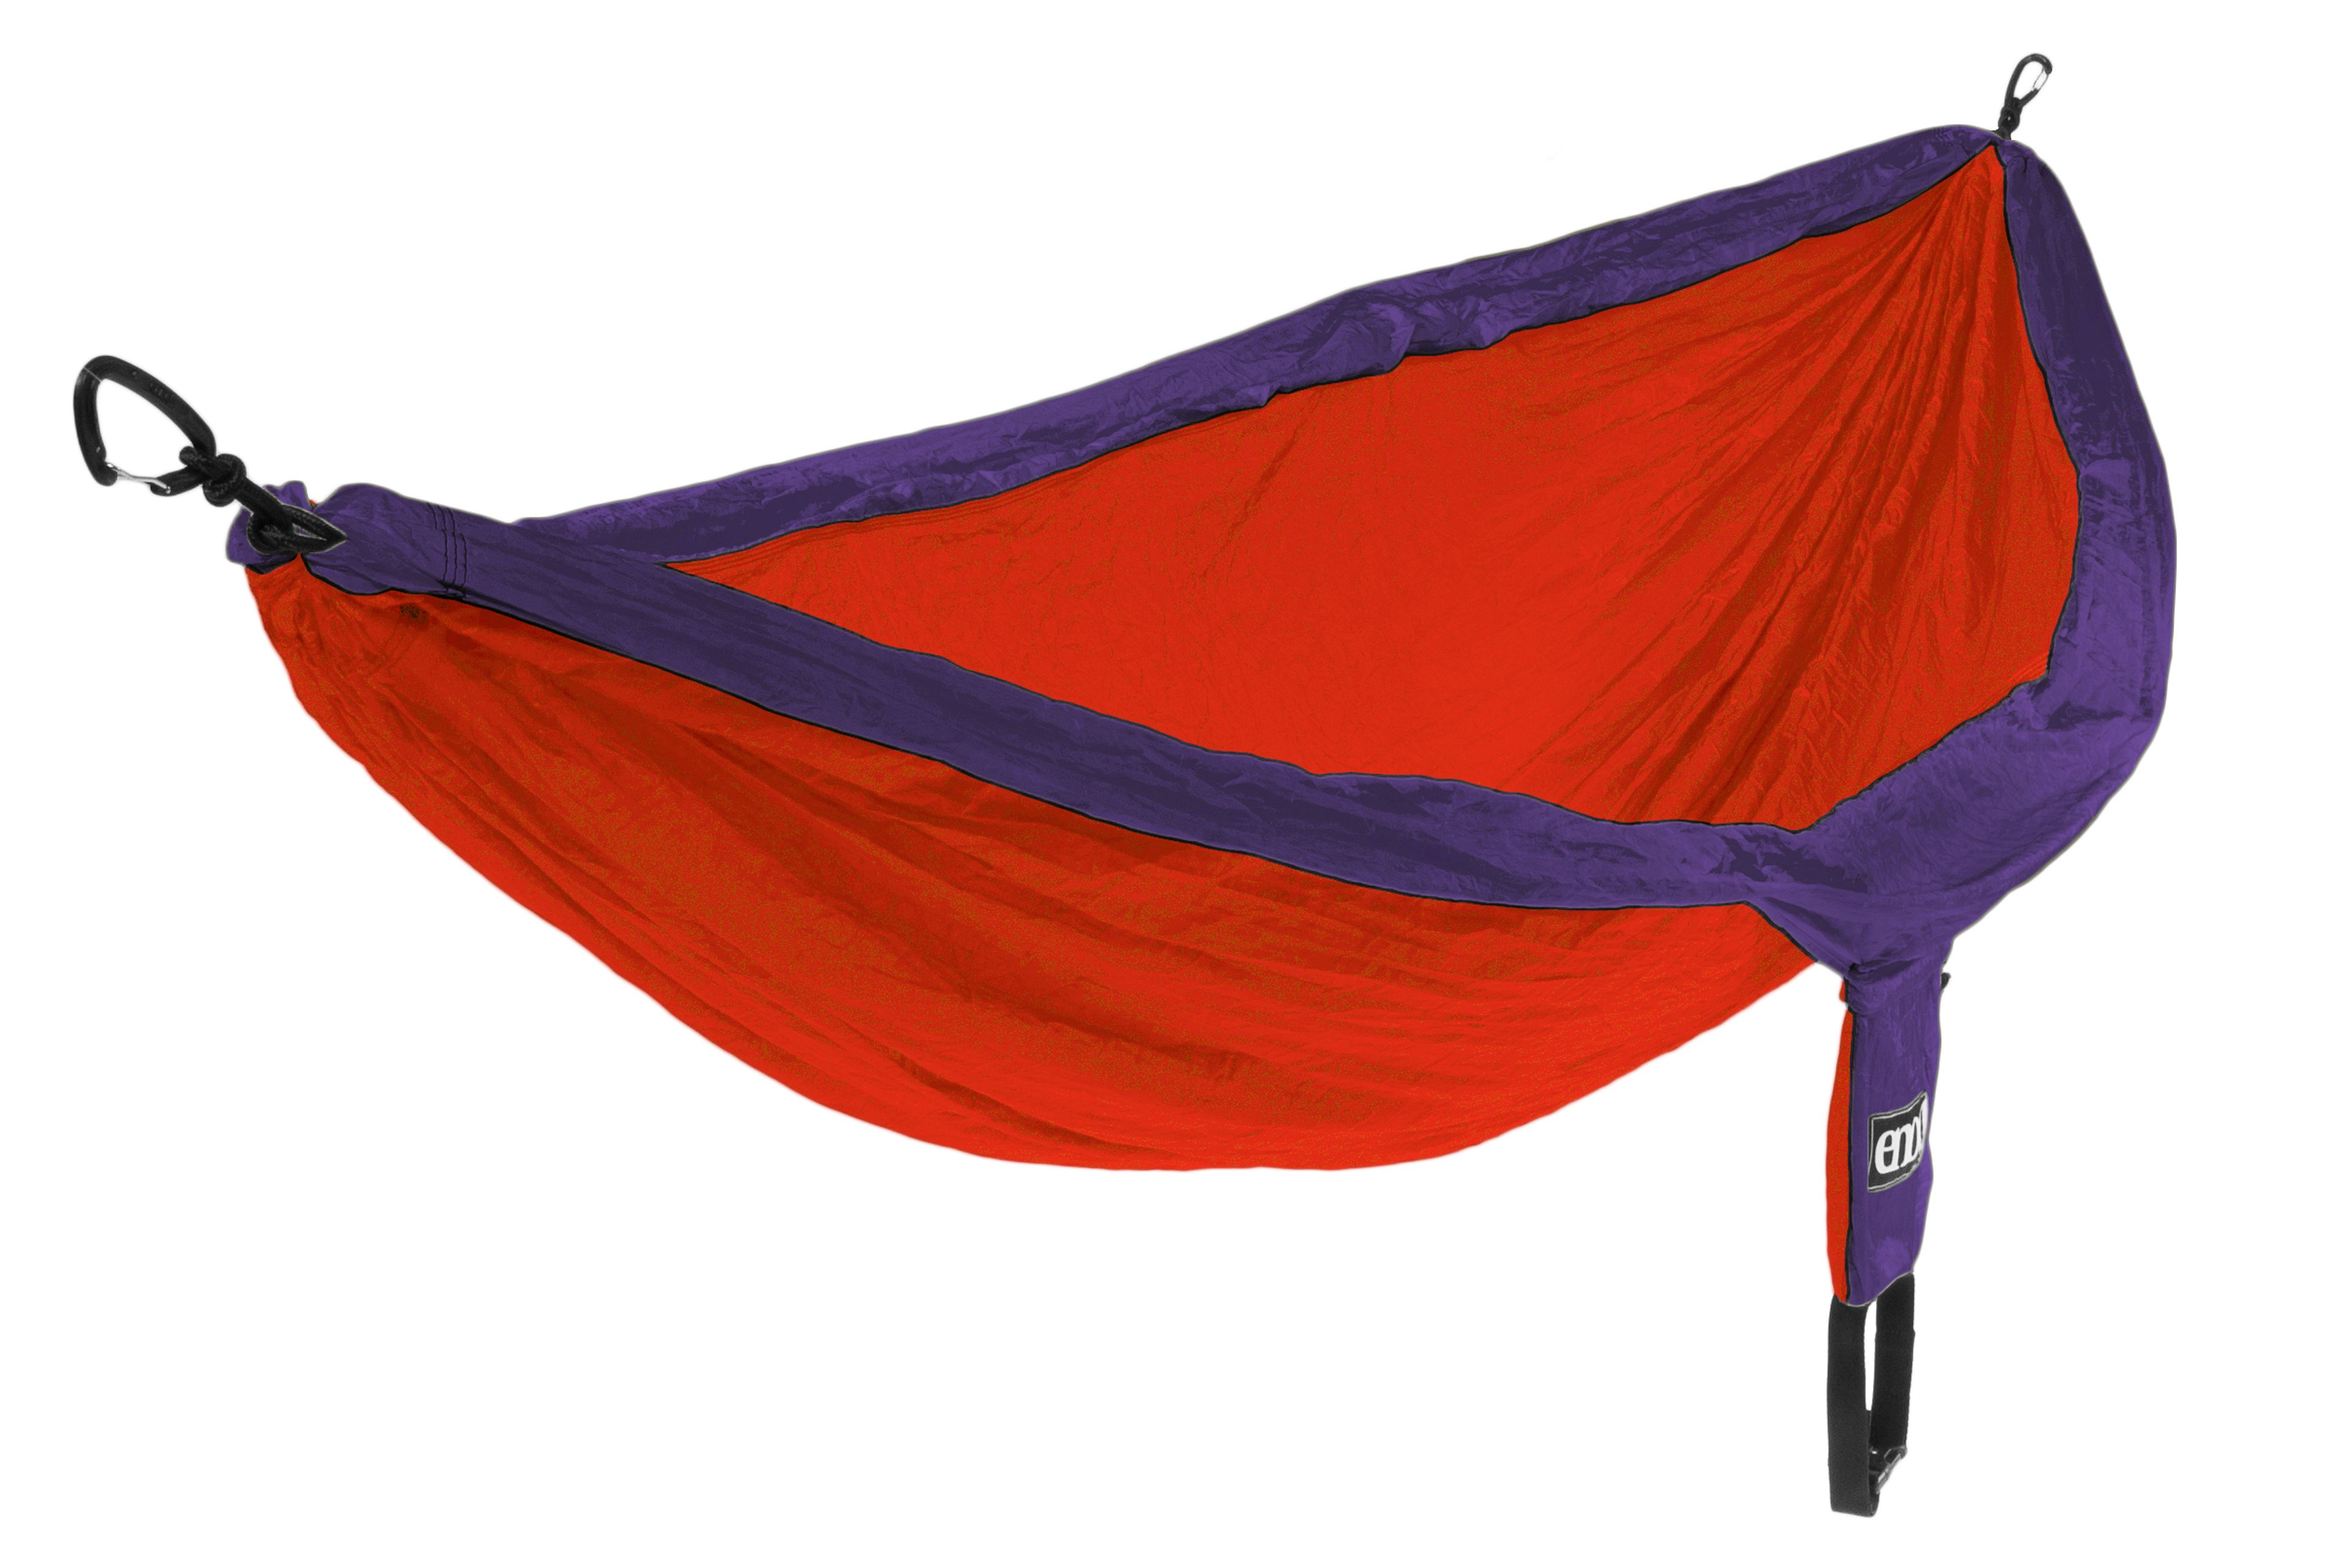 eno photo pinterest forest singlenest hammock shoot pin purple